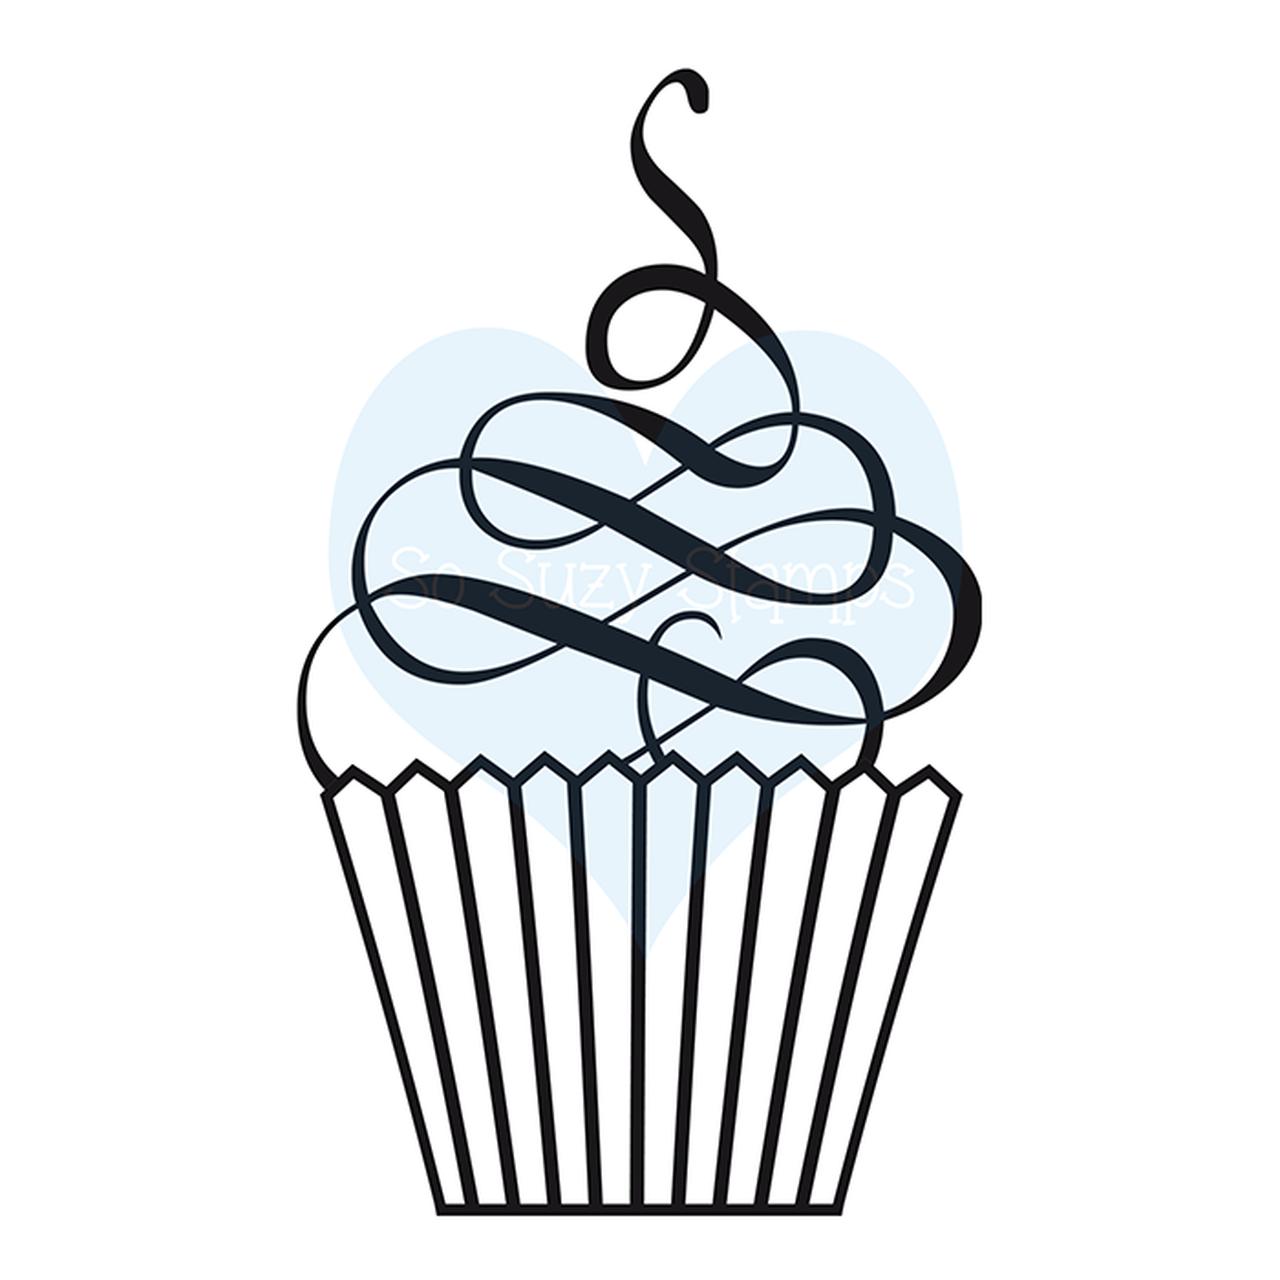 clip art royalty free download Baking drawing swirl. Skinny cupcake